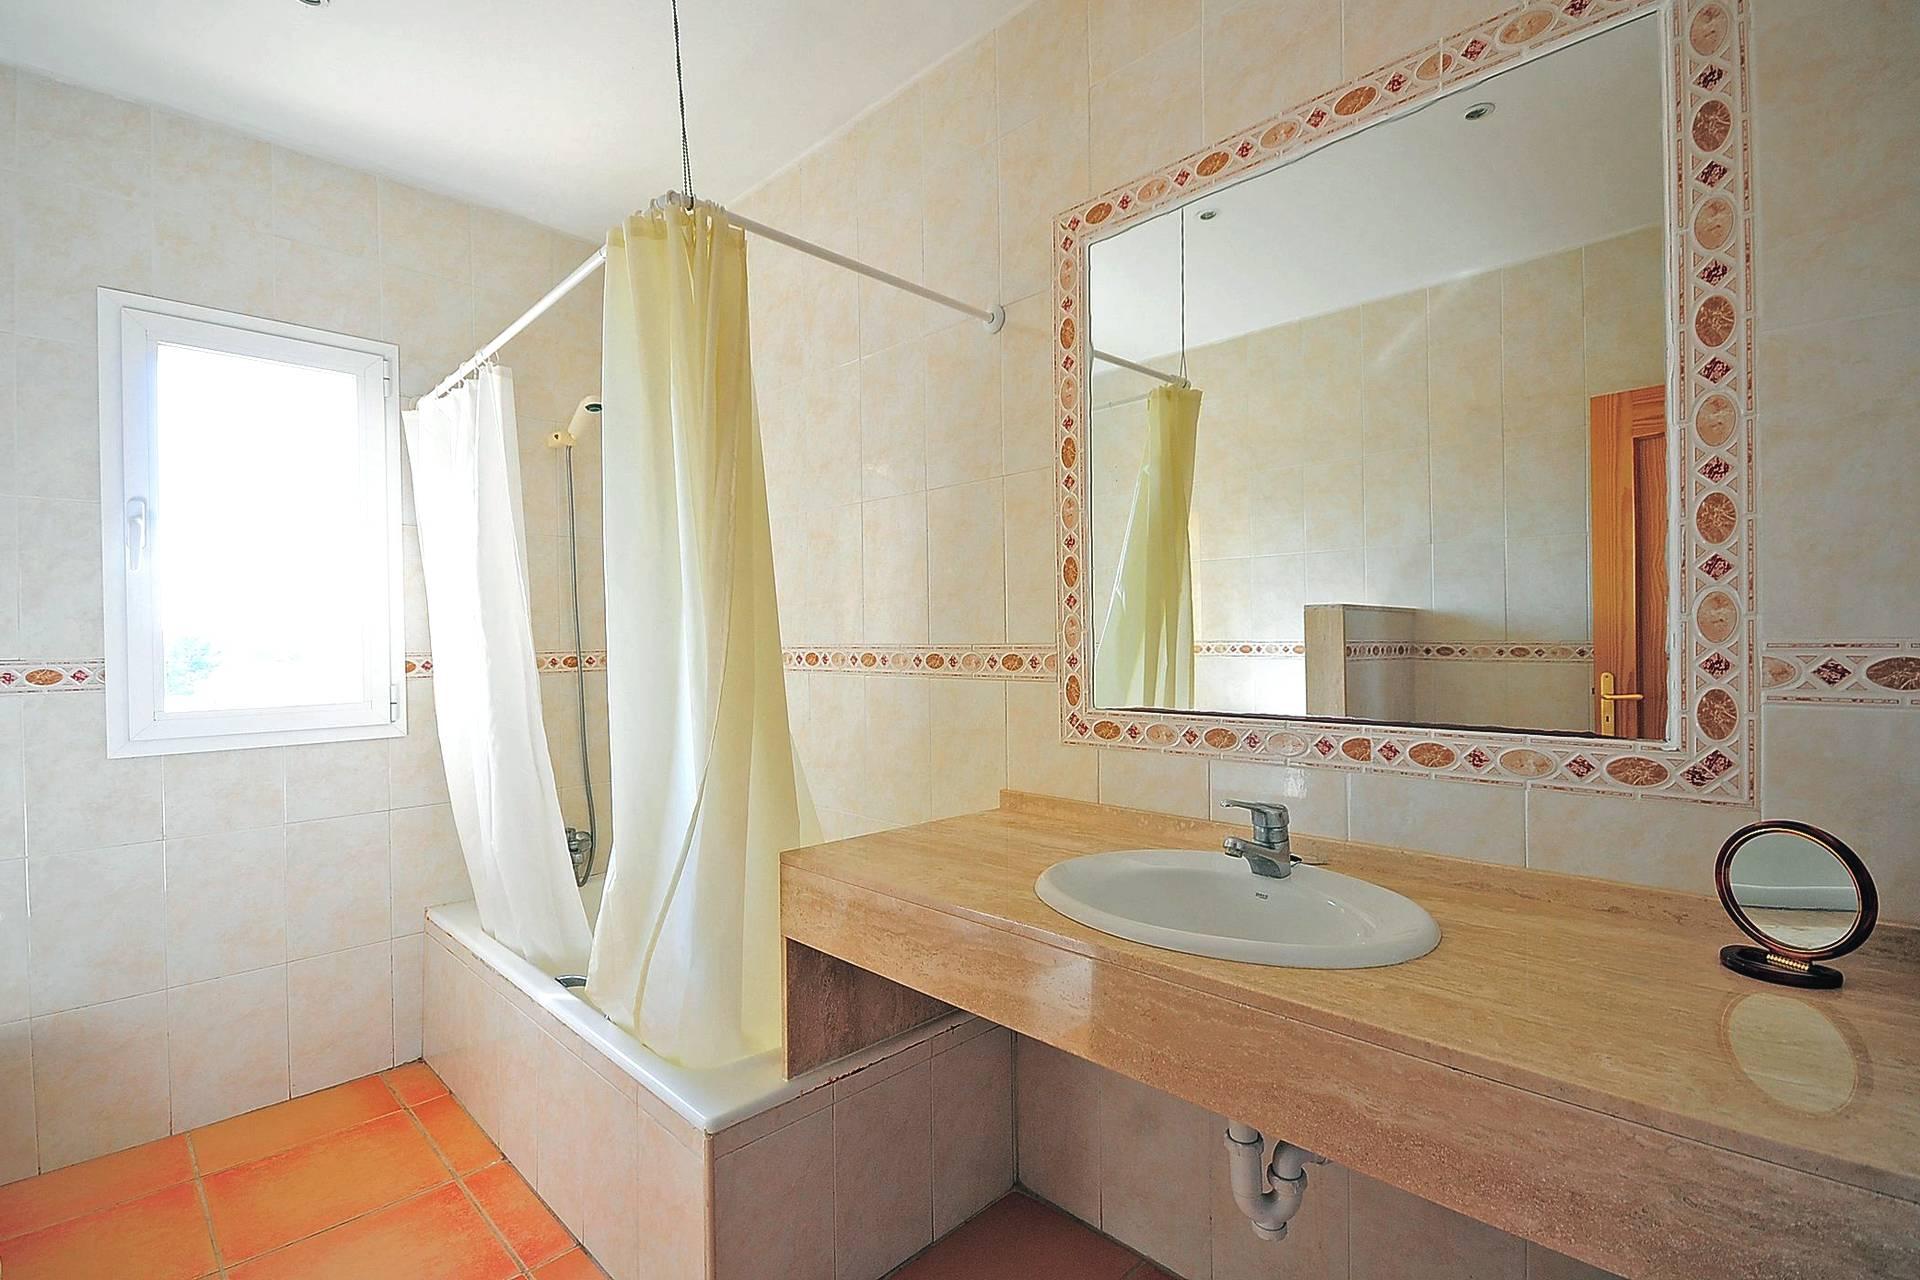 01-233 Ferienhaus am Strand Mallorca Norden Bild 20